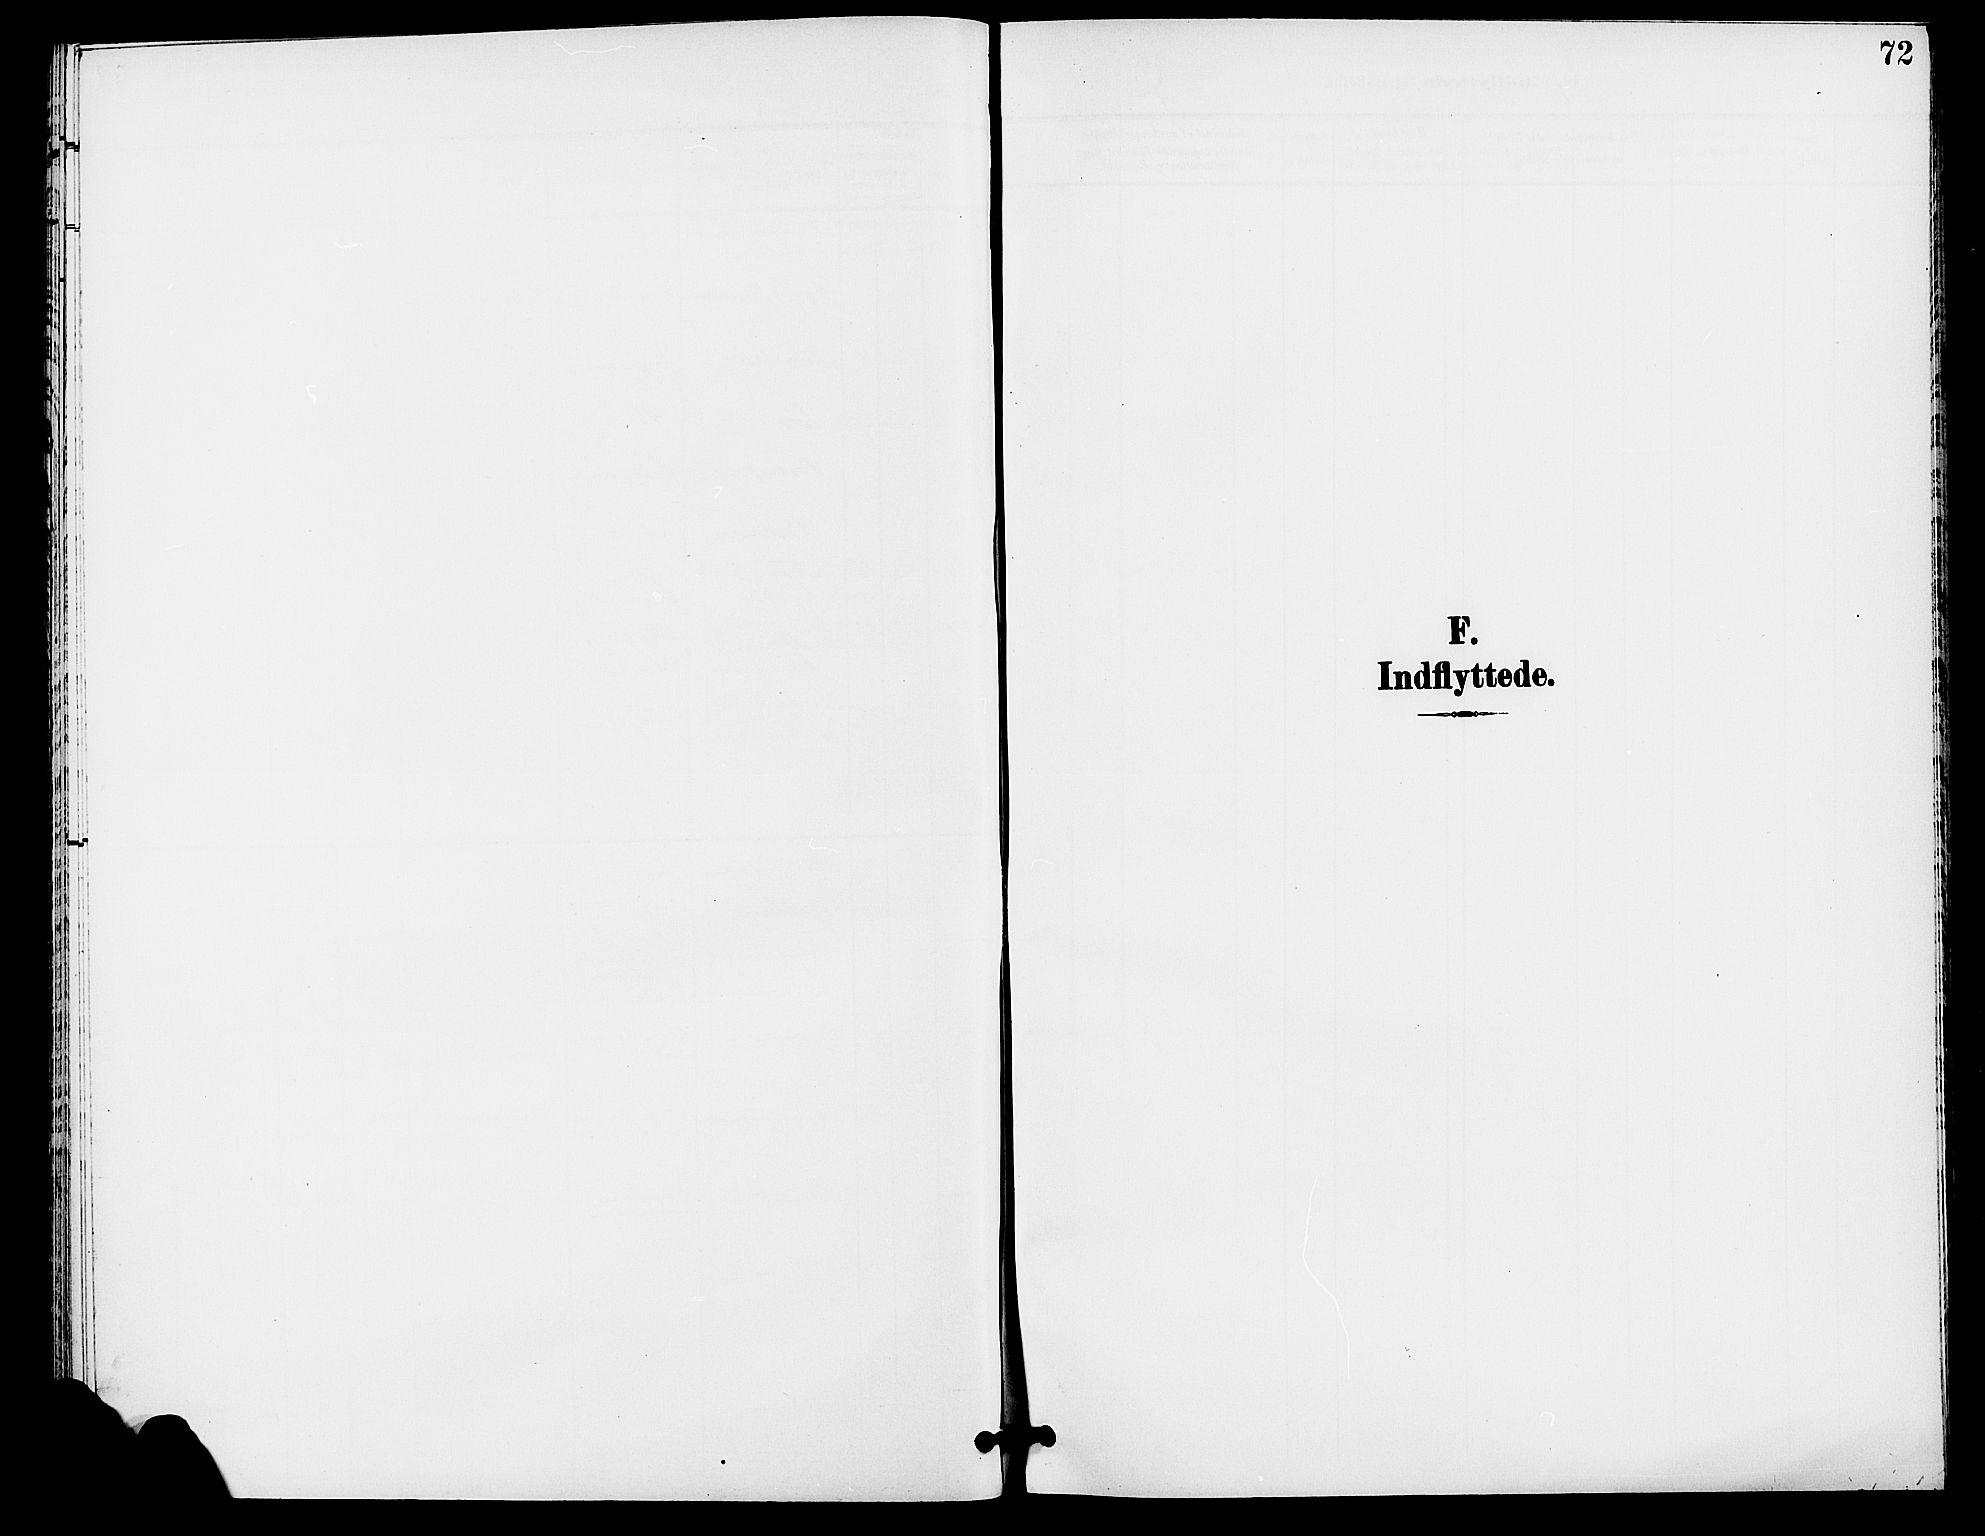 SAH, Rendalen prestekontor, H/Ha/Haa/L0008: Ministerialbok nr. 8, 1898-1910, s. 72